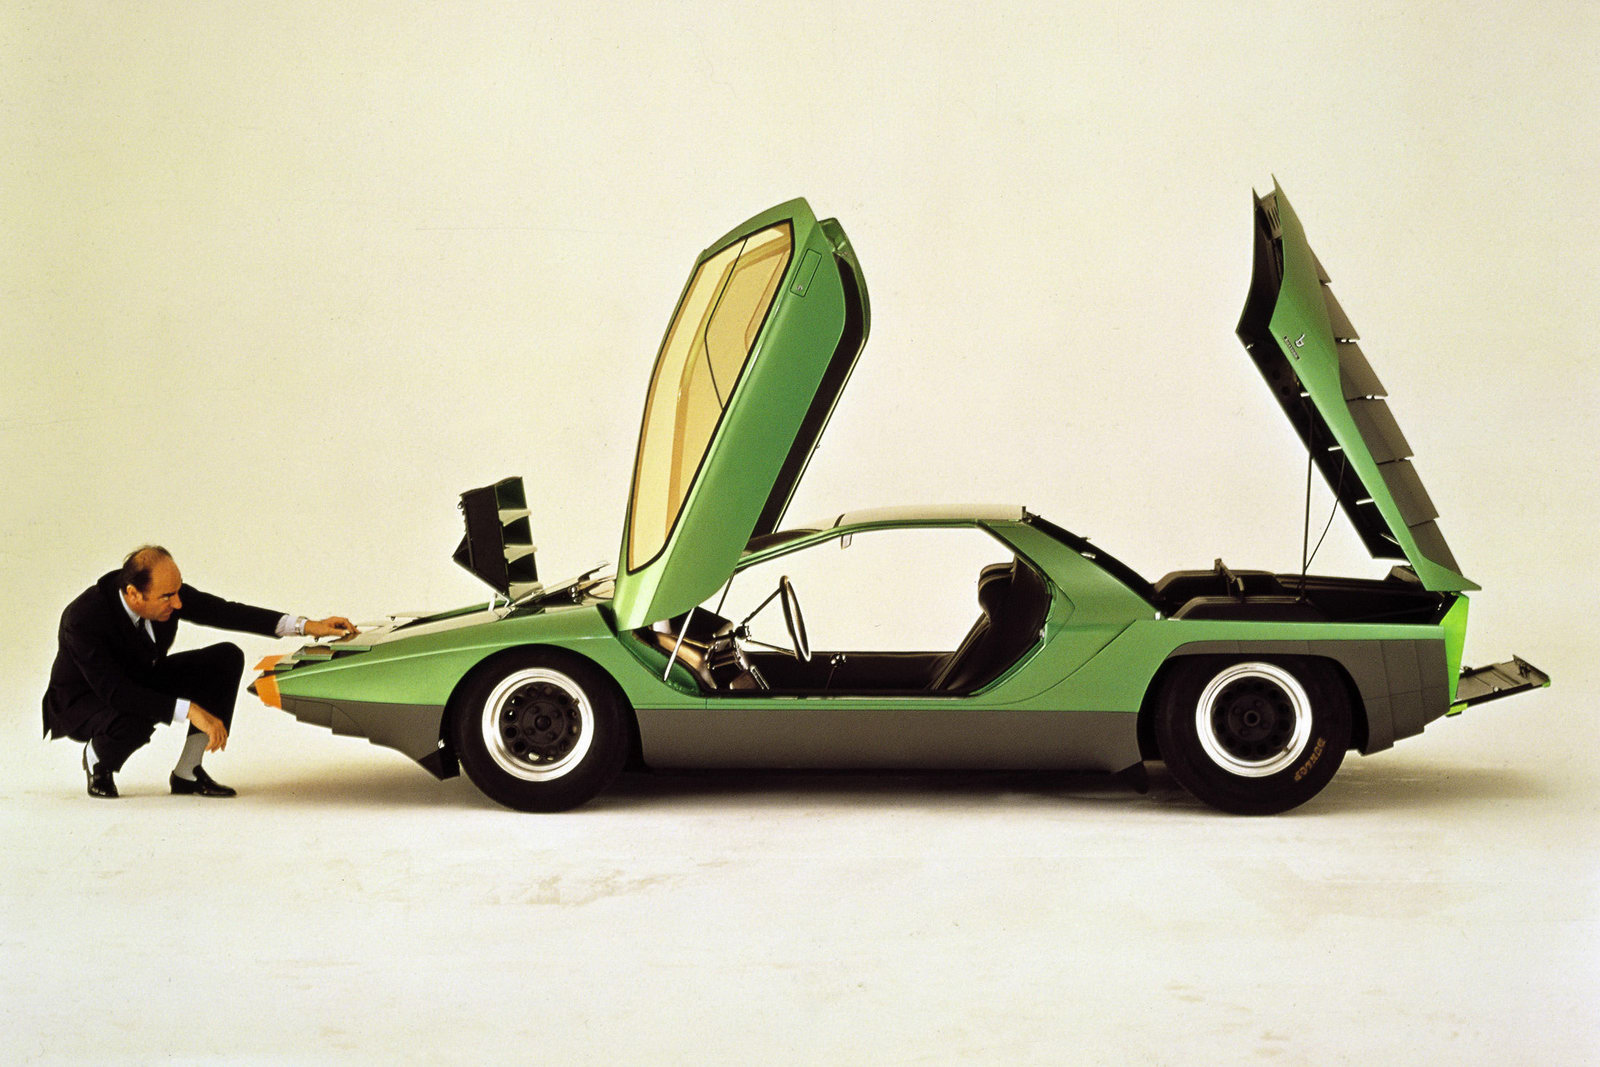 http://1.bp.blogspot.com/_FoXyvaPSnVk/S_ydpXAh2vI/AAAAAAAC4-c/Km_JR7O2SSA/s1600/Bertone-Alfa-Romeo-Carabo-8.jpg